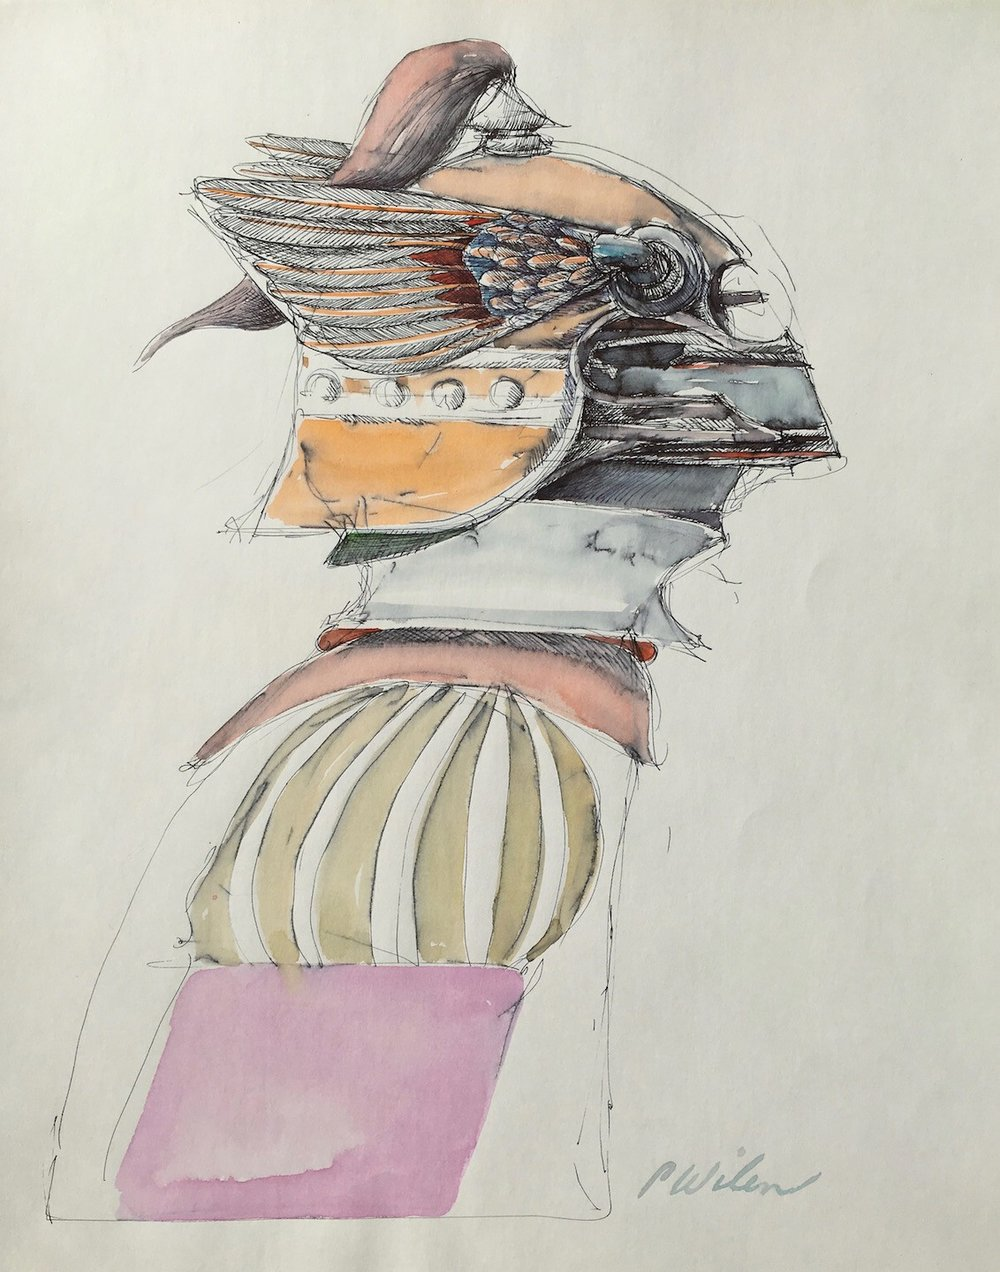 wilen_medieval_knight_iv_16_x_13_watercolor_ink.jpg